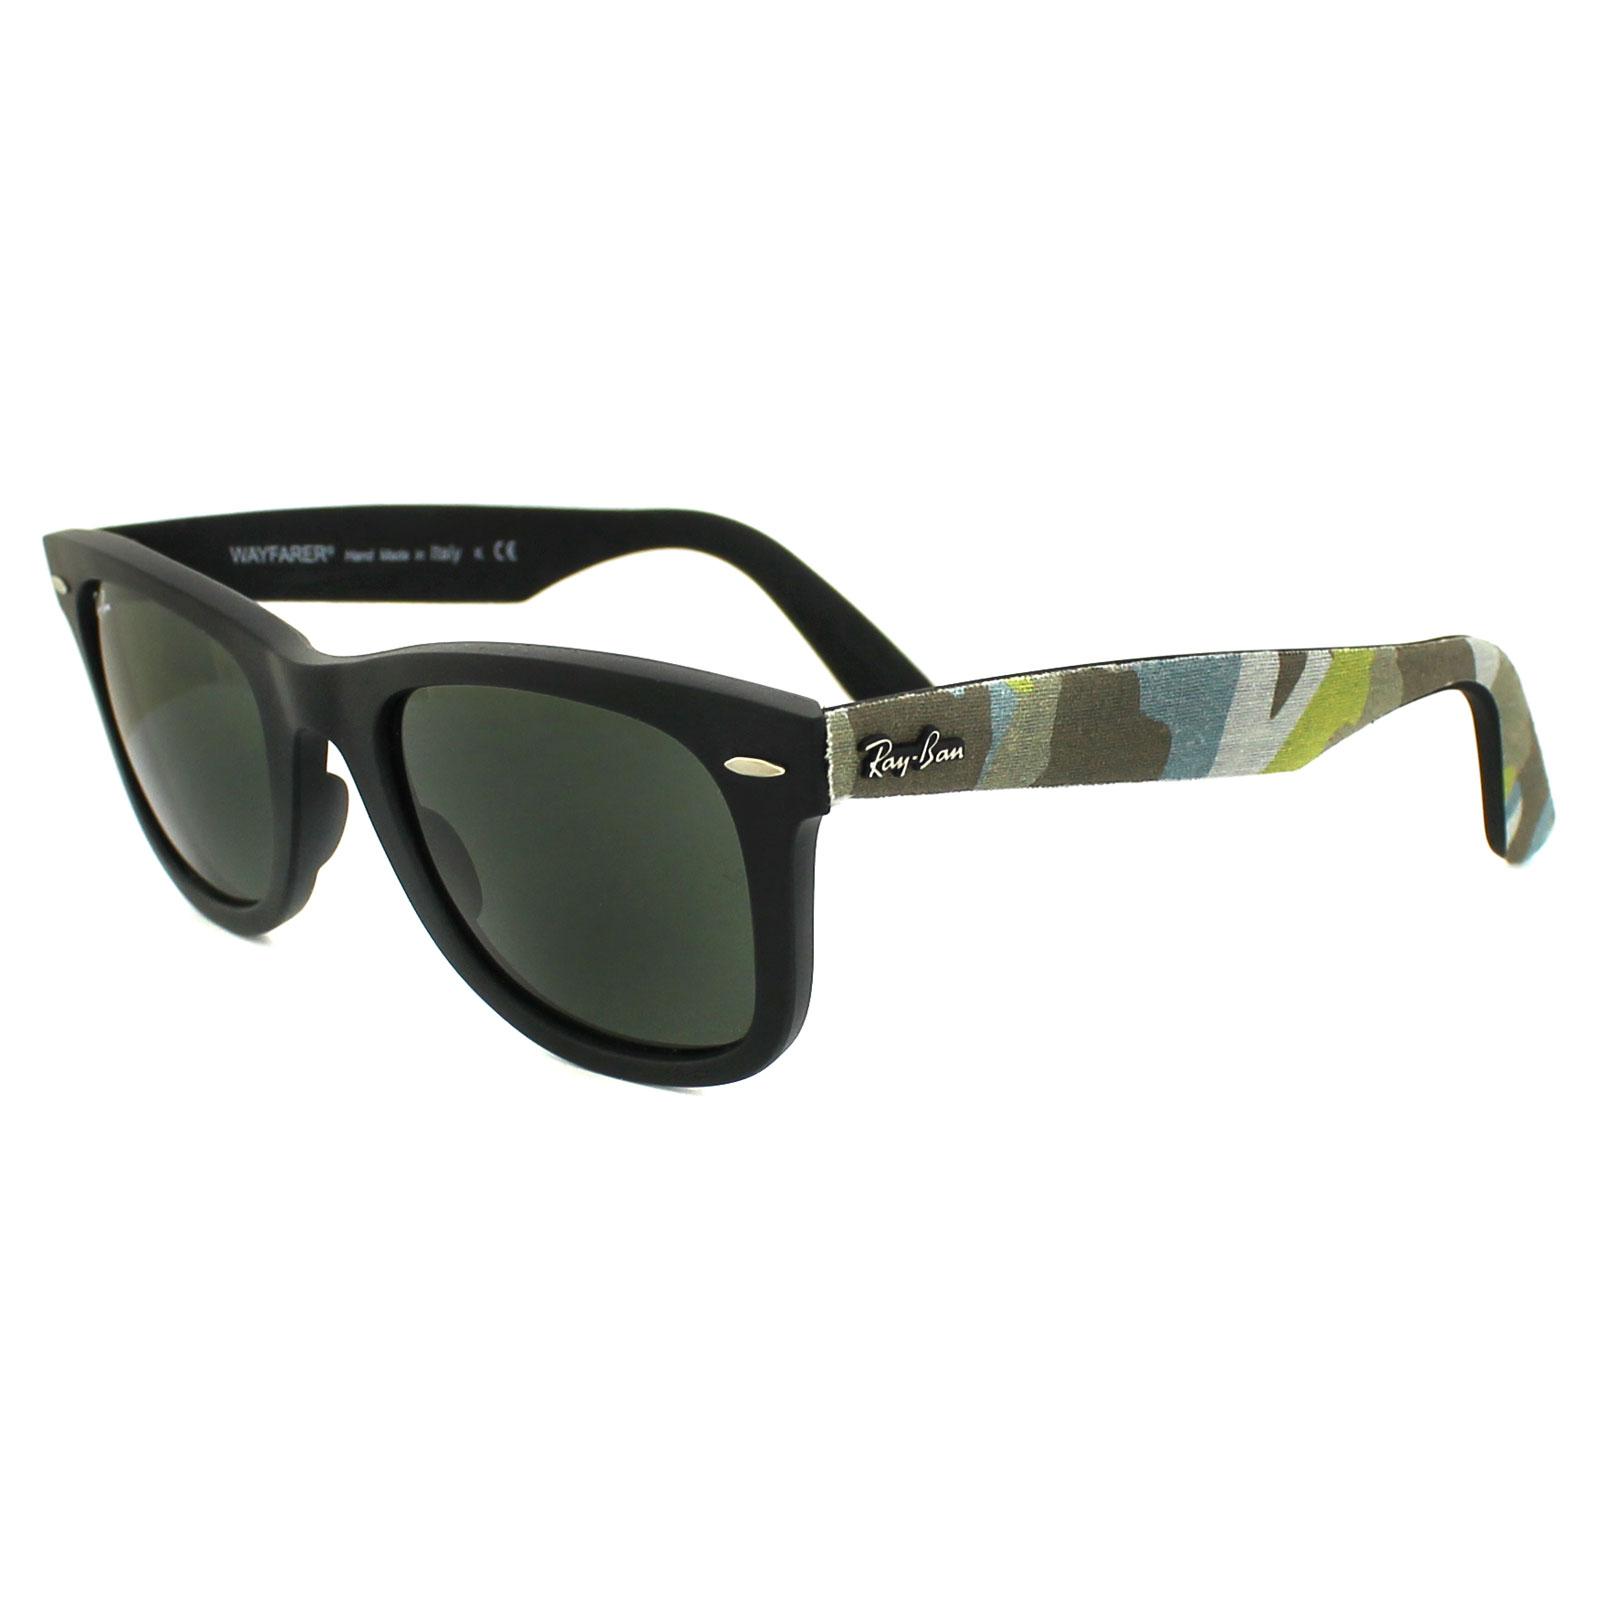 ray ban sunglasses wayfarer 2140 6065 matt black camo green ebay. Black Bedroom Furniture Sets. Home Design Ideas